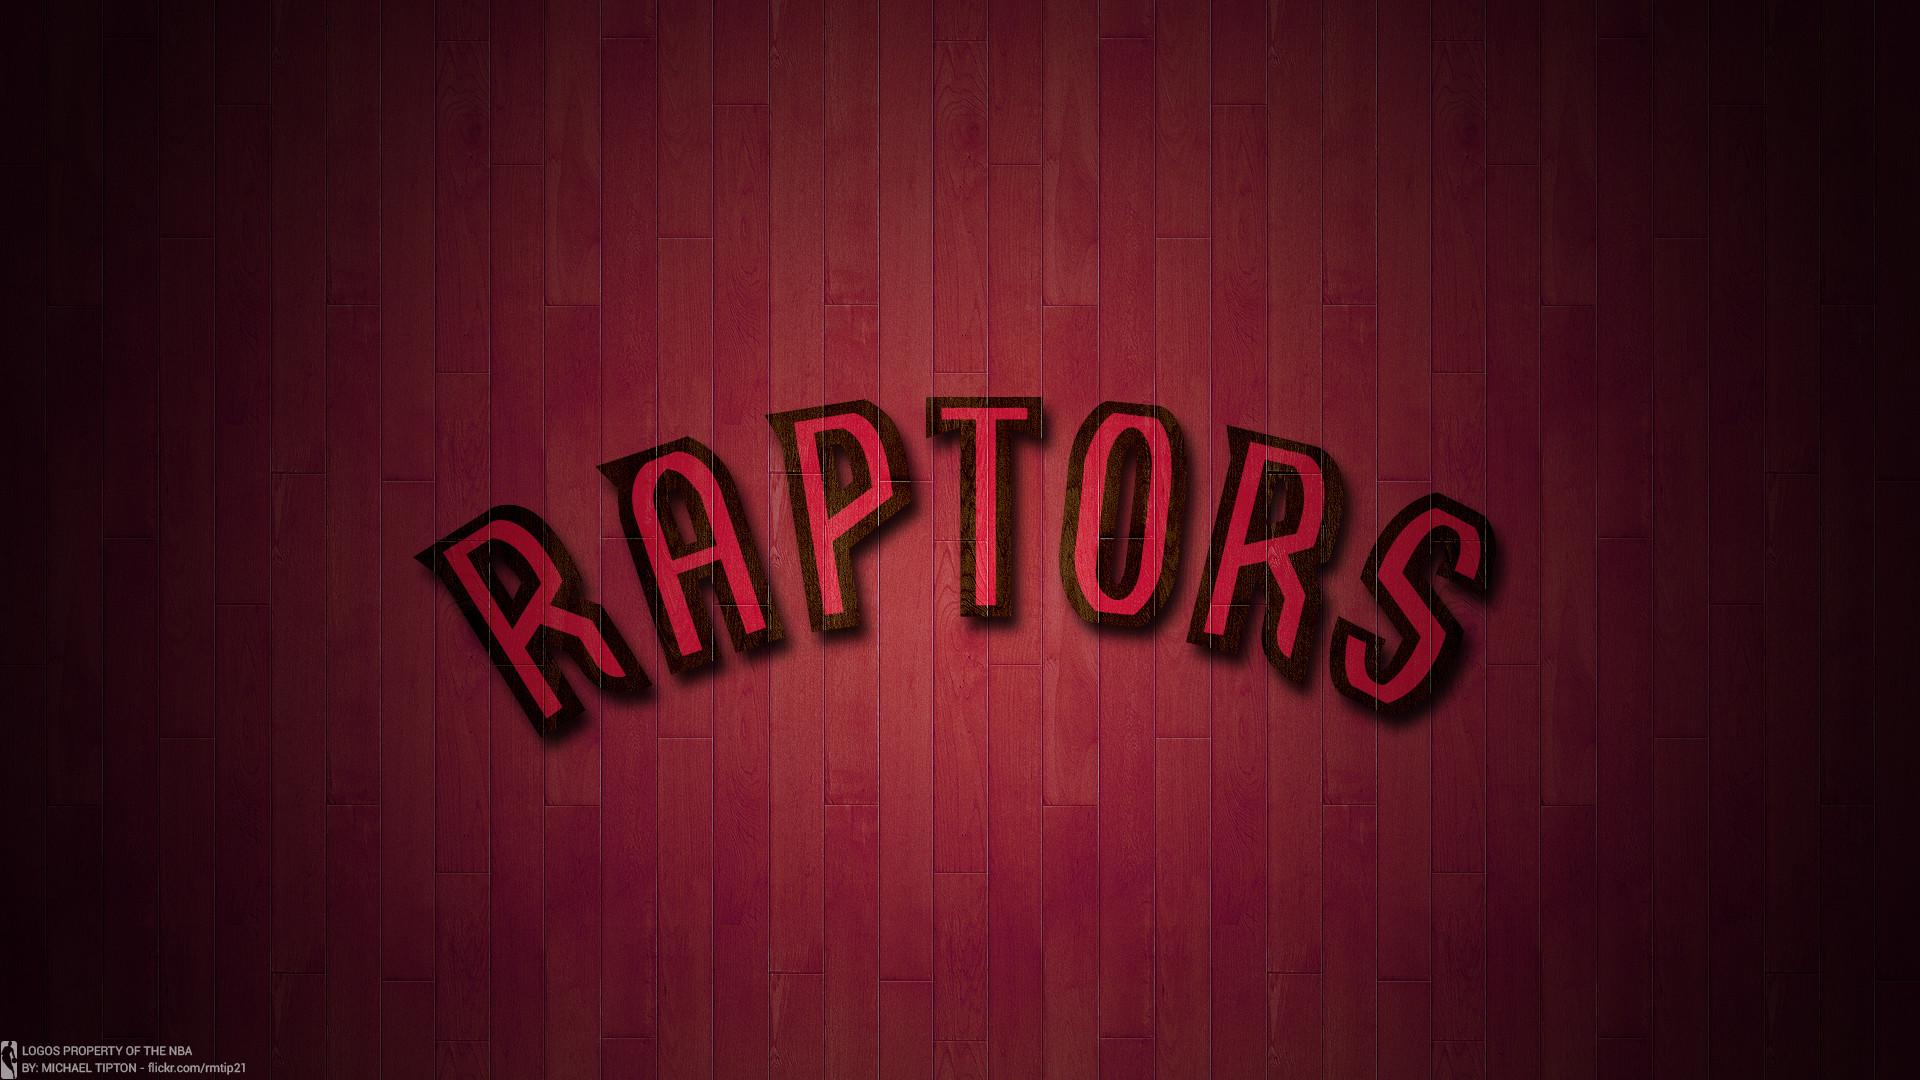 … NBA 2017 Toronto Raptors hardwood logo desktop wallpaper